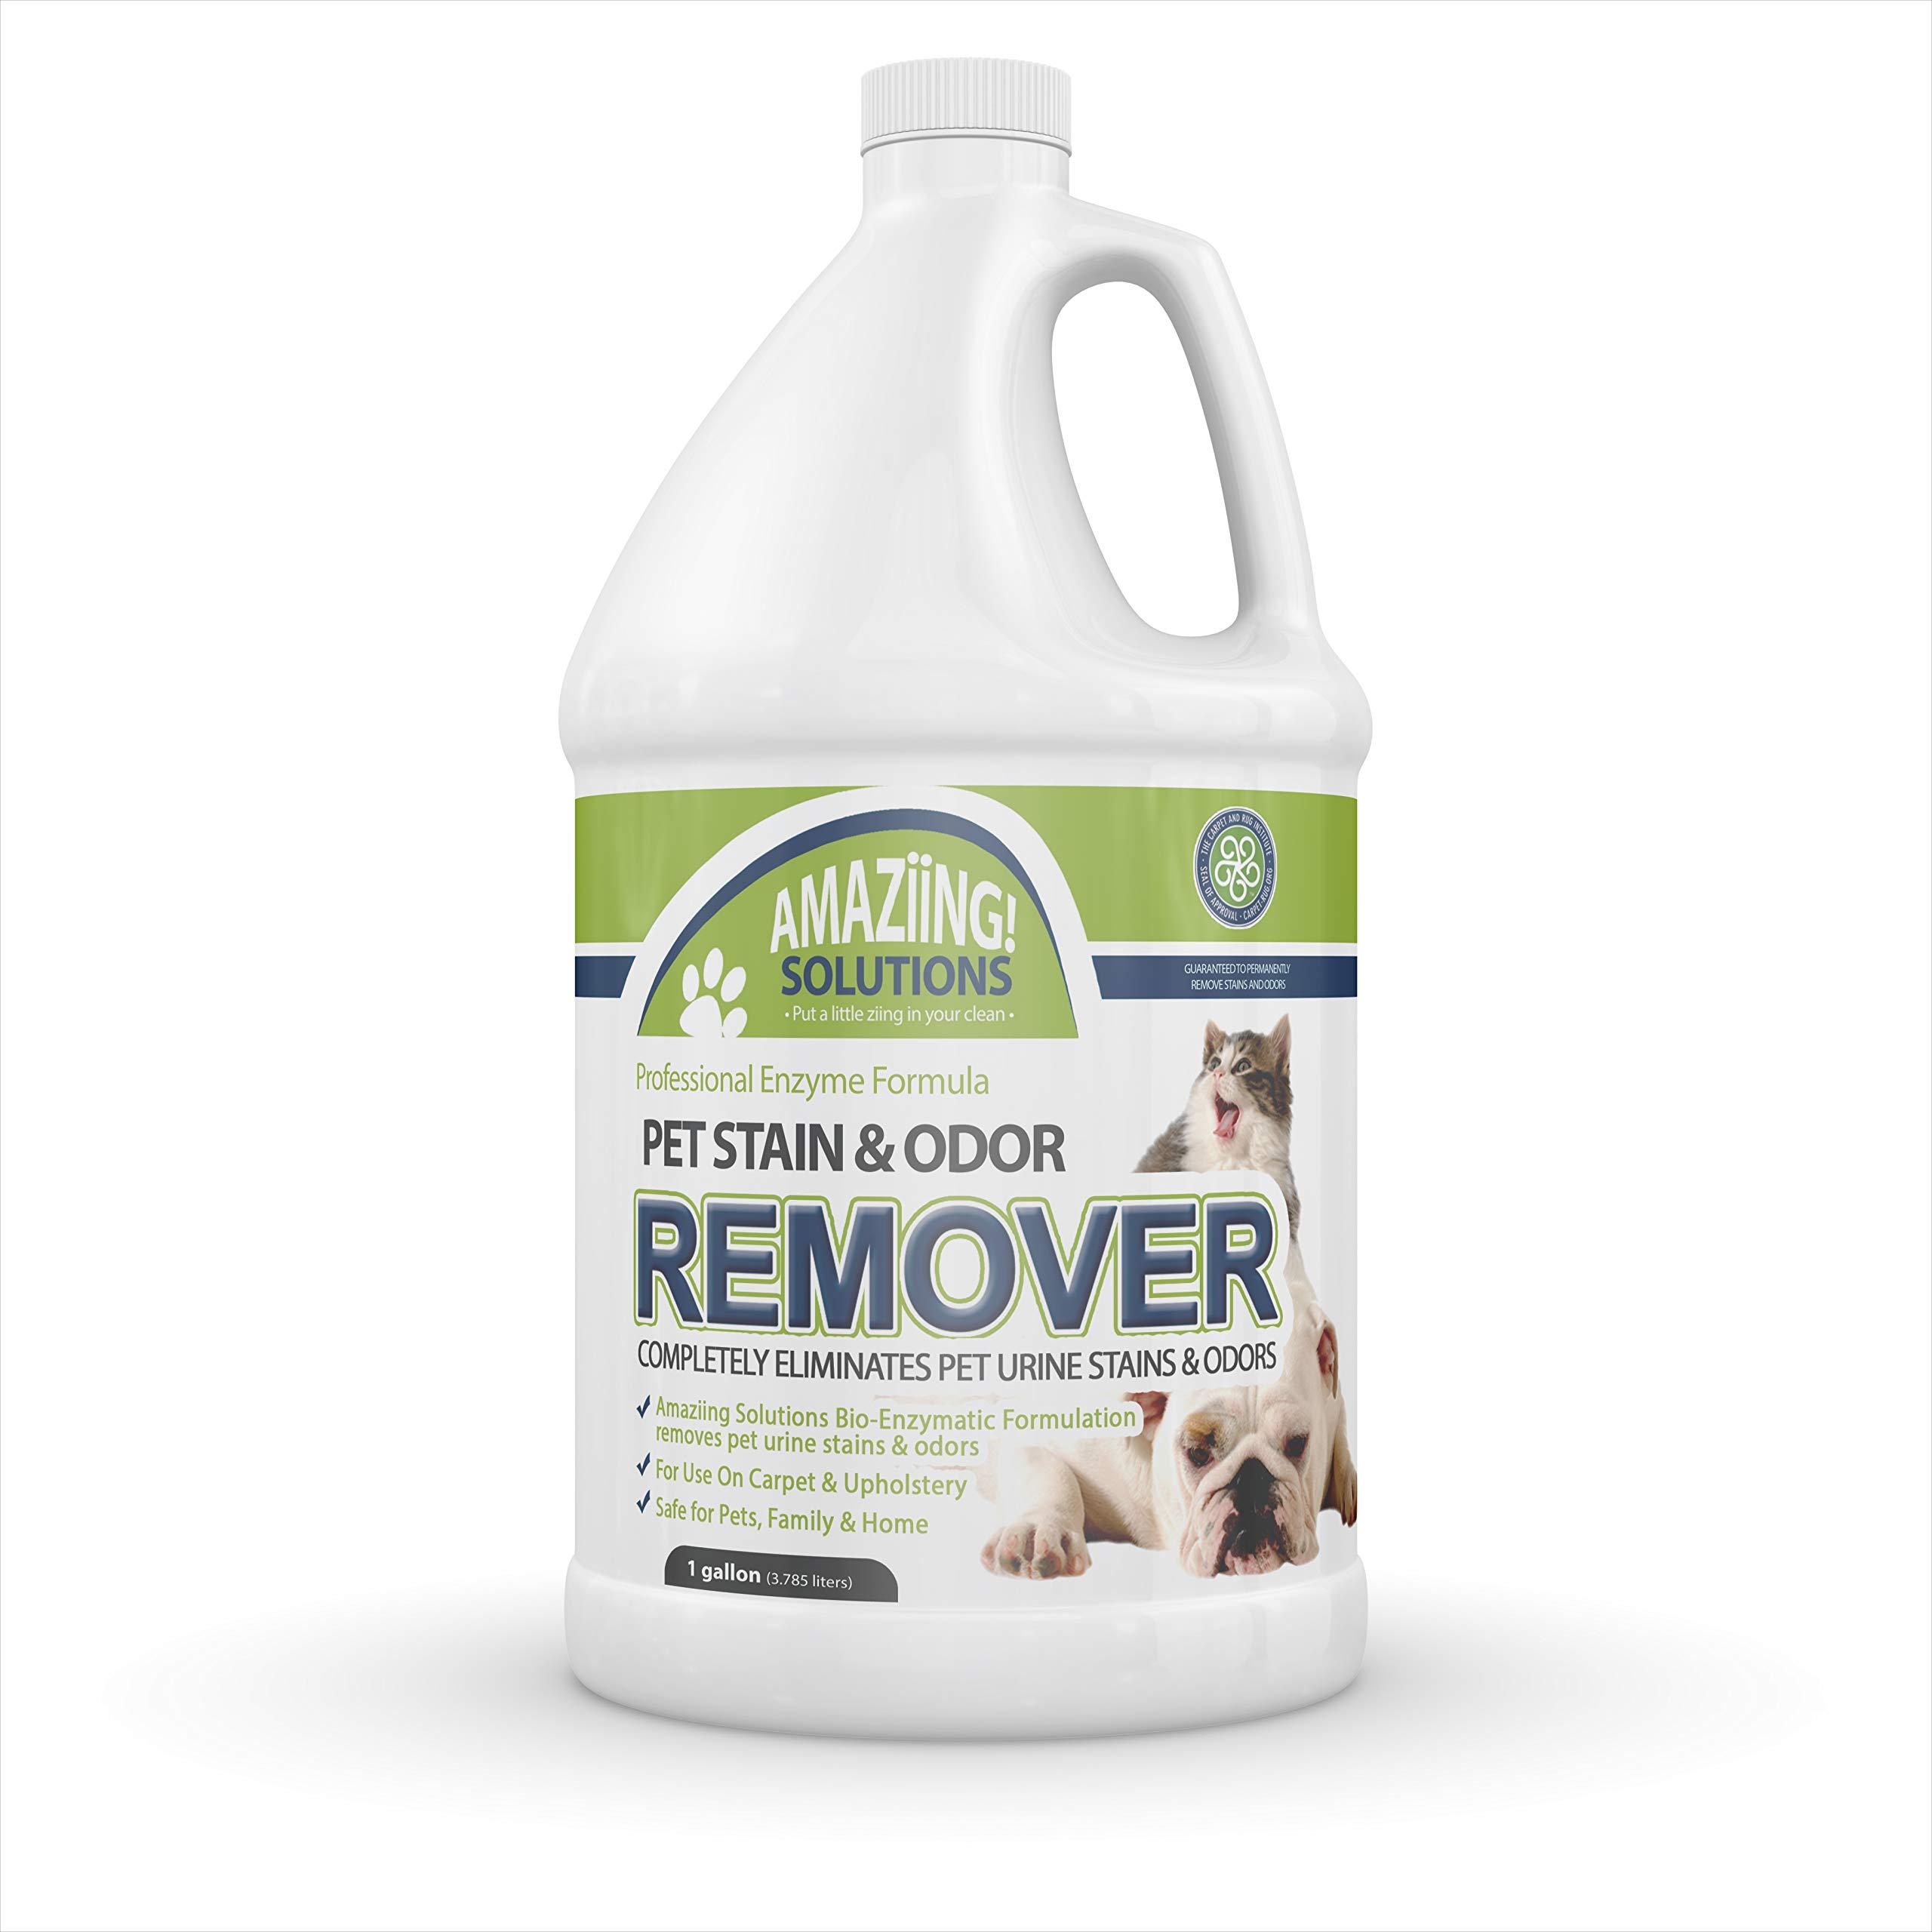 Dog Urine Smell In Wool Carpet: Dog Diarrhea On Cream Carpet